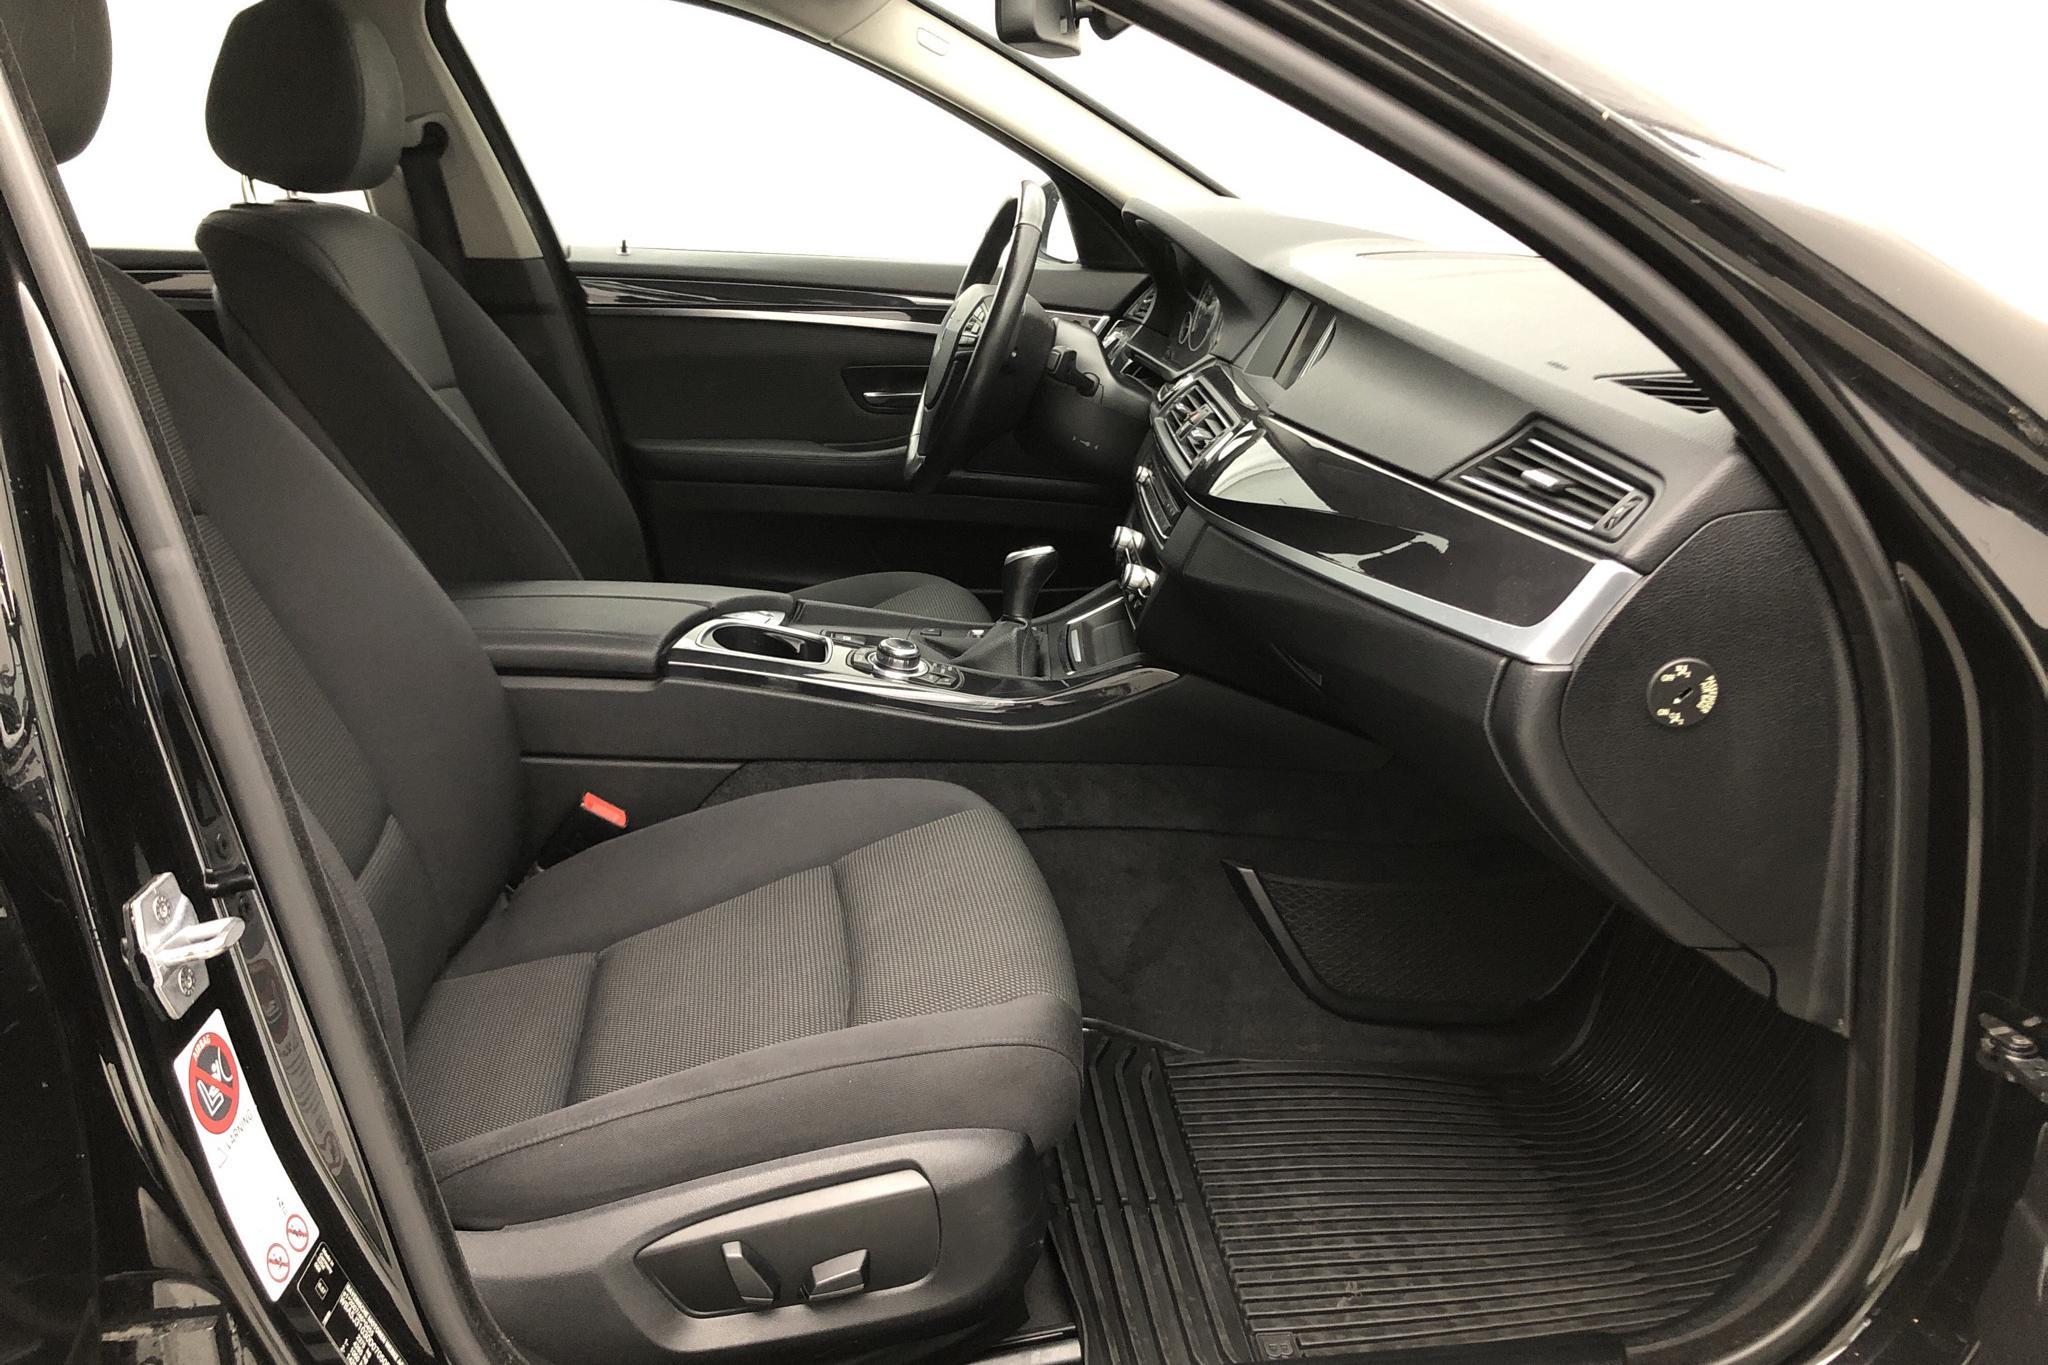 BMW 520d Touring, F11 (184hk) - 248 412 km - Manual - black - 2014